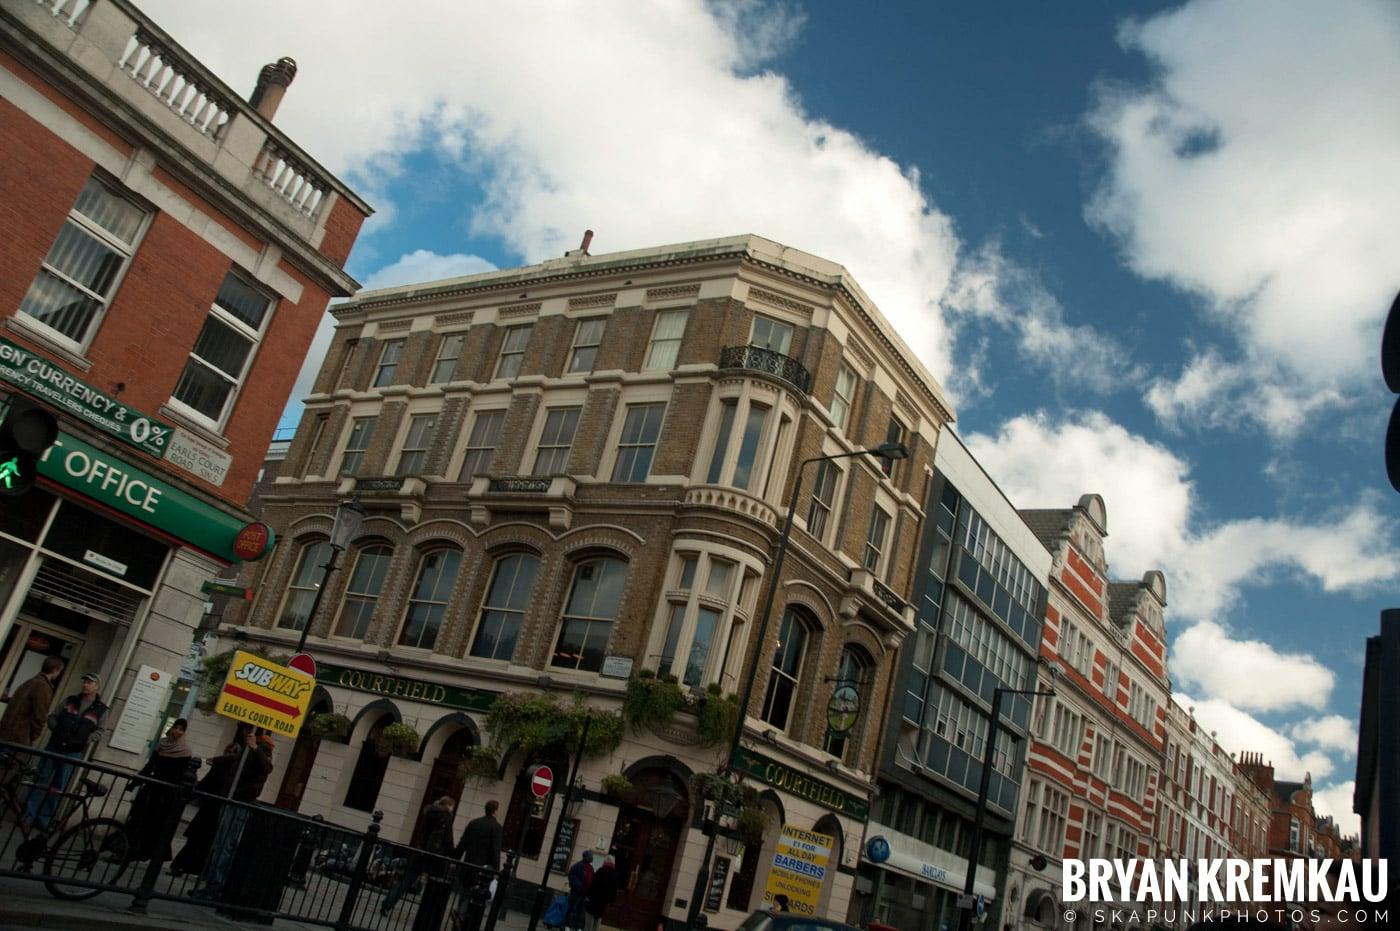 London, England - Day 2 - 12.9.06 (1)